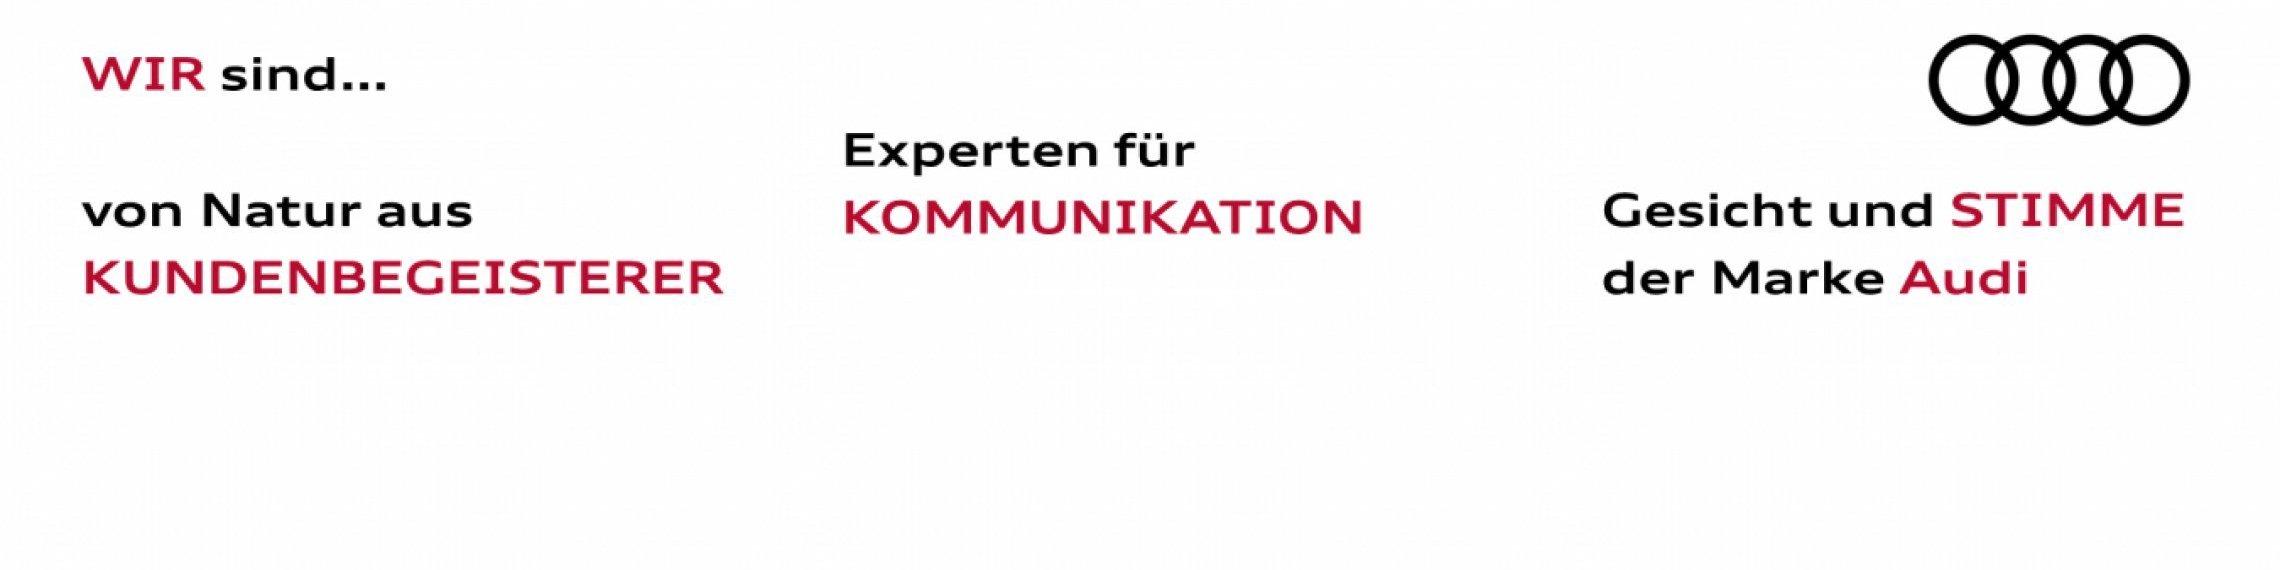 Ingolstadt ag krankmeldung audi Adresse